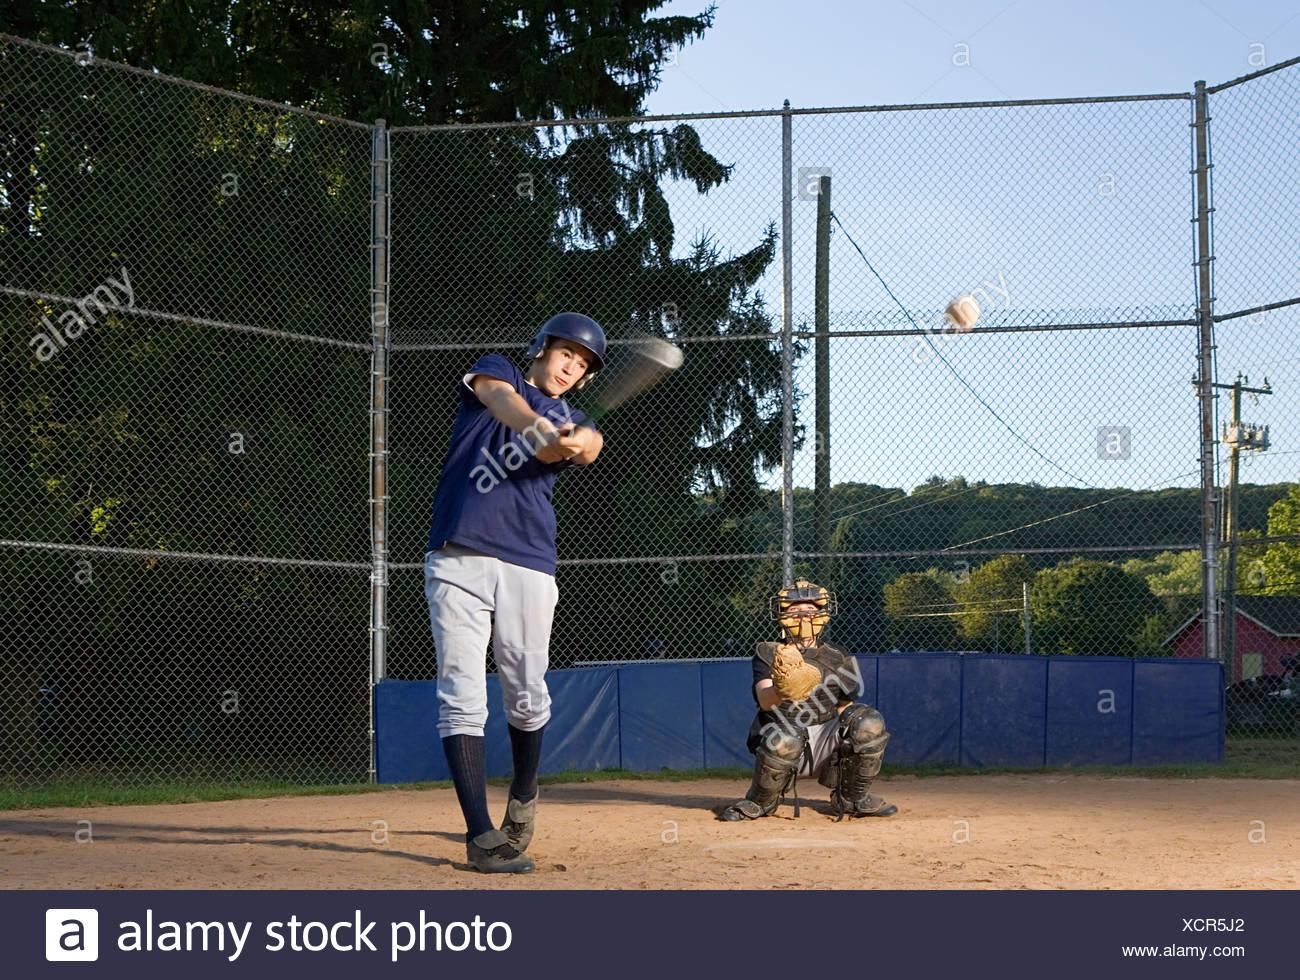 Adolescente oscilante al pelota Foto de stock